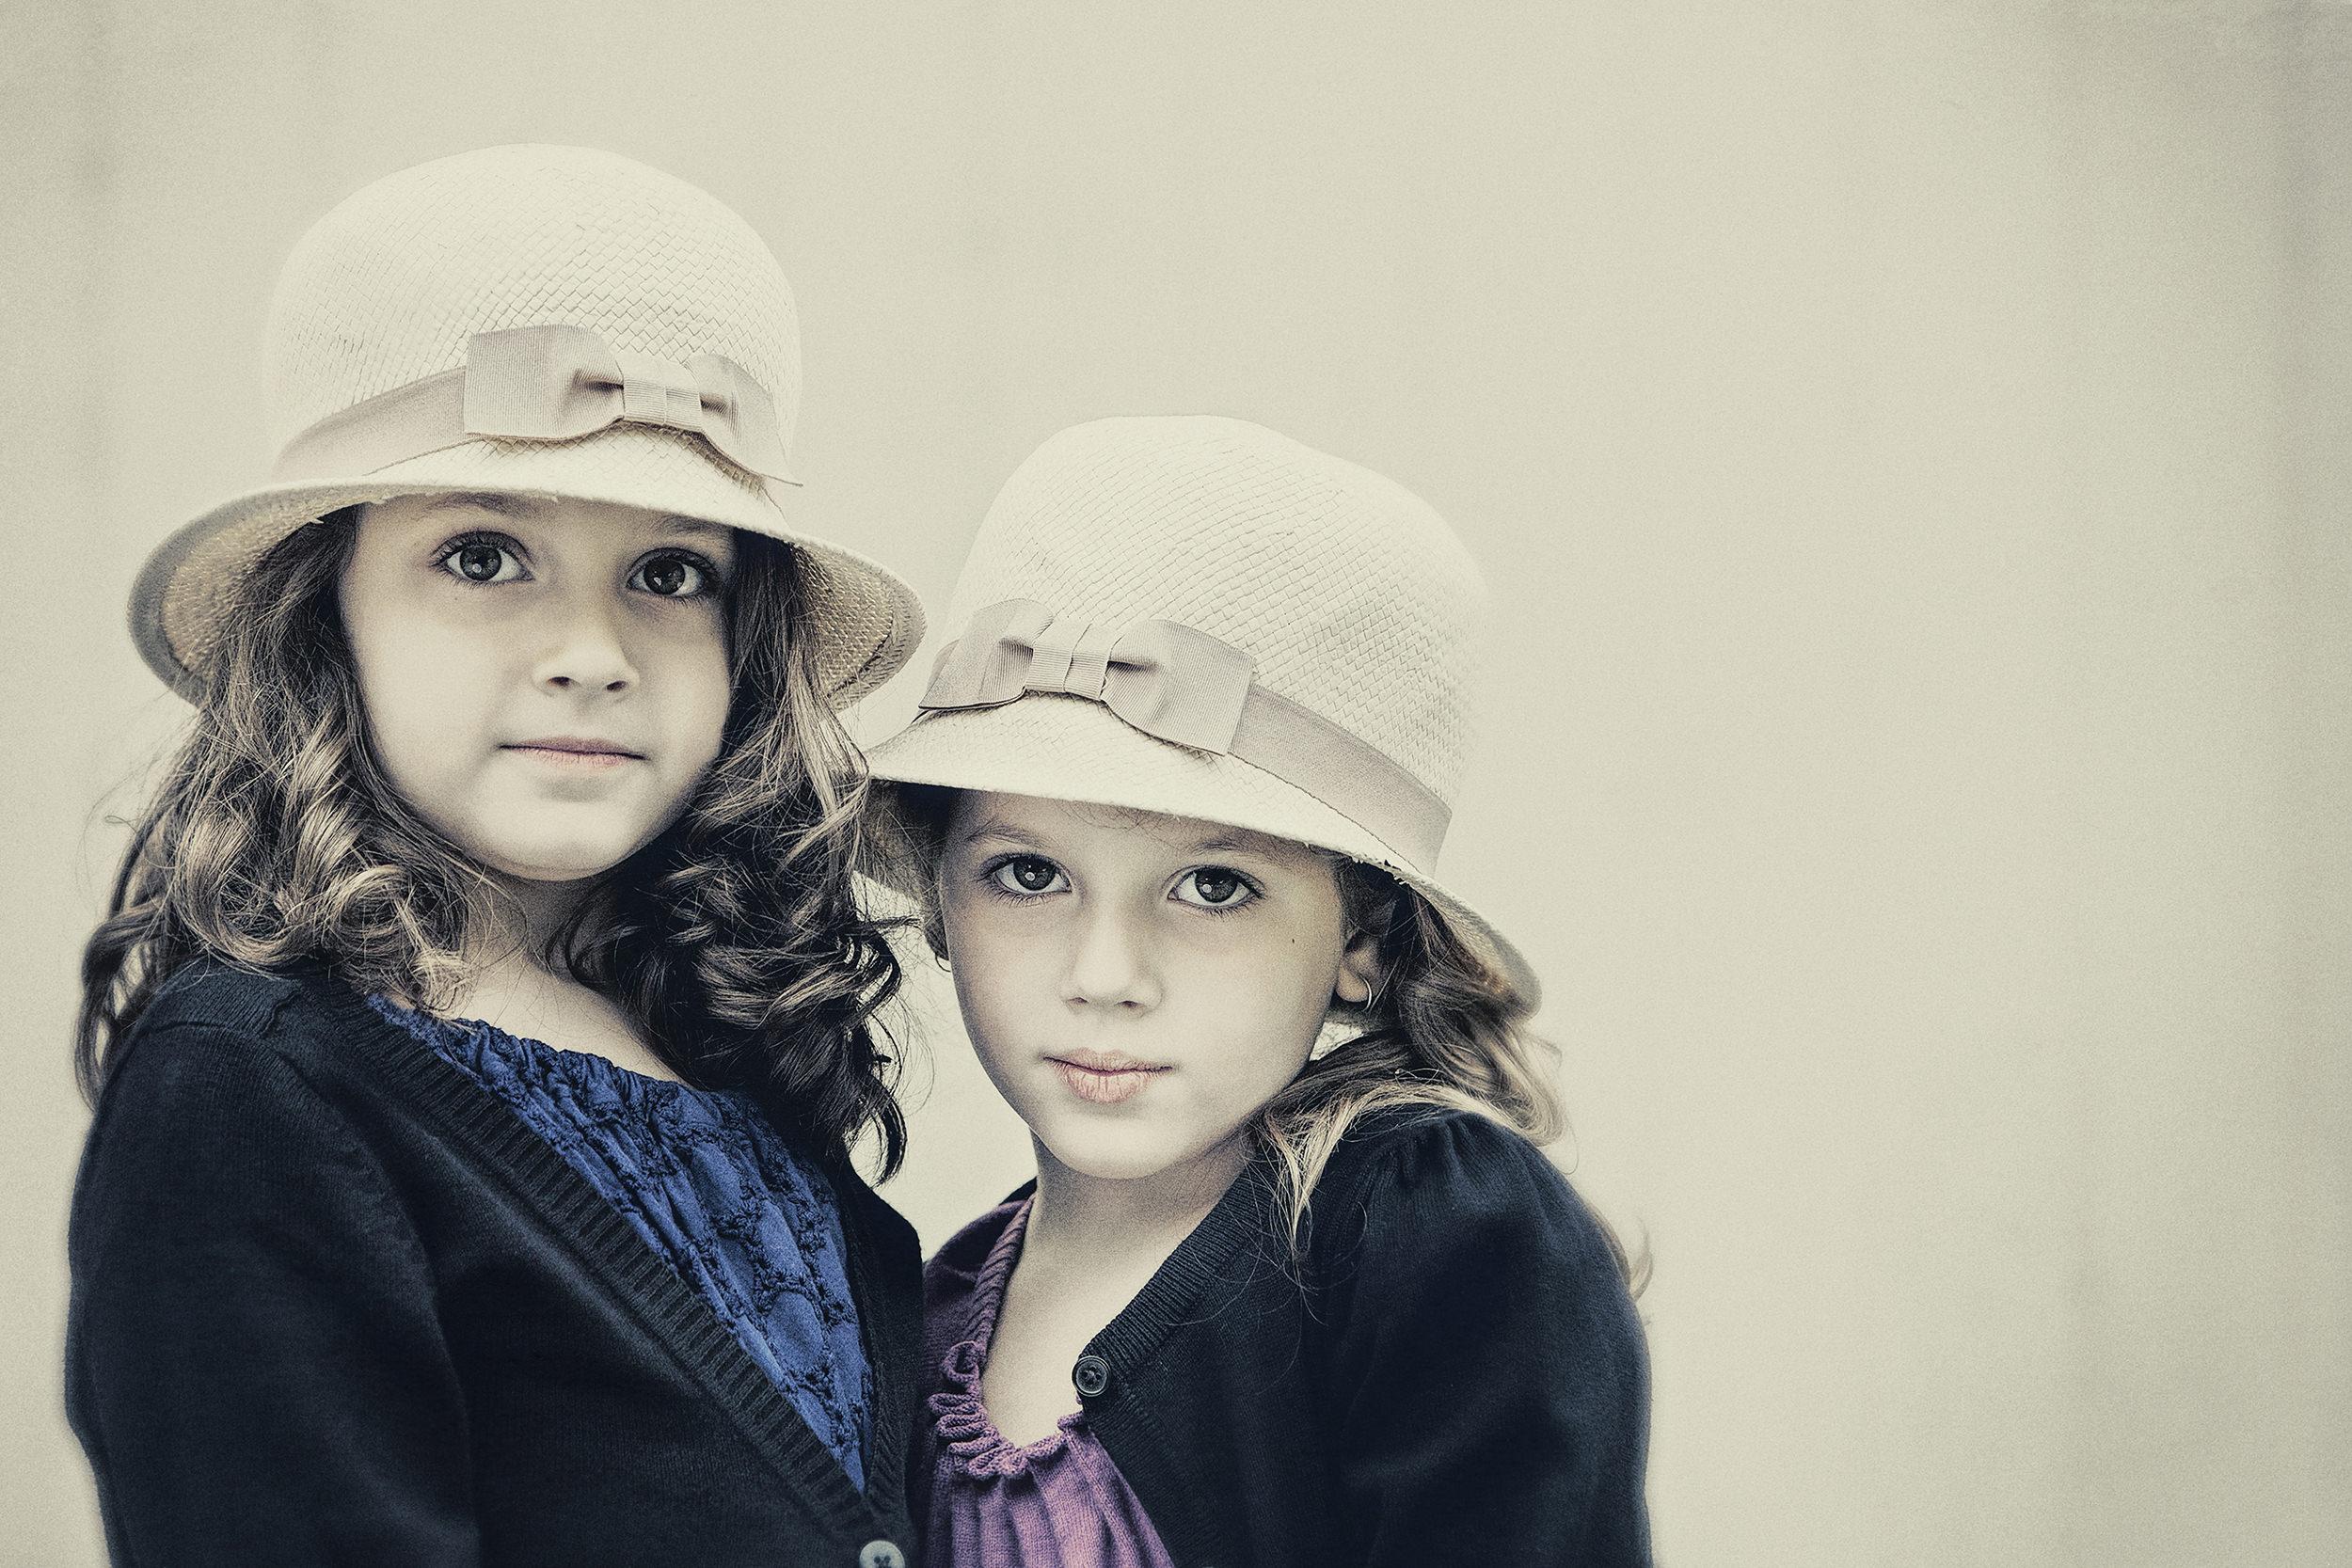 Gallery-sisters-fine art portraits-portraiture.jpg